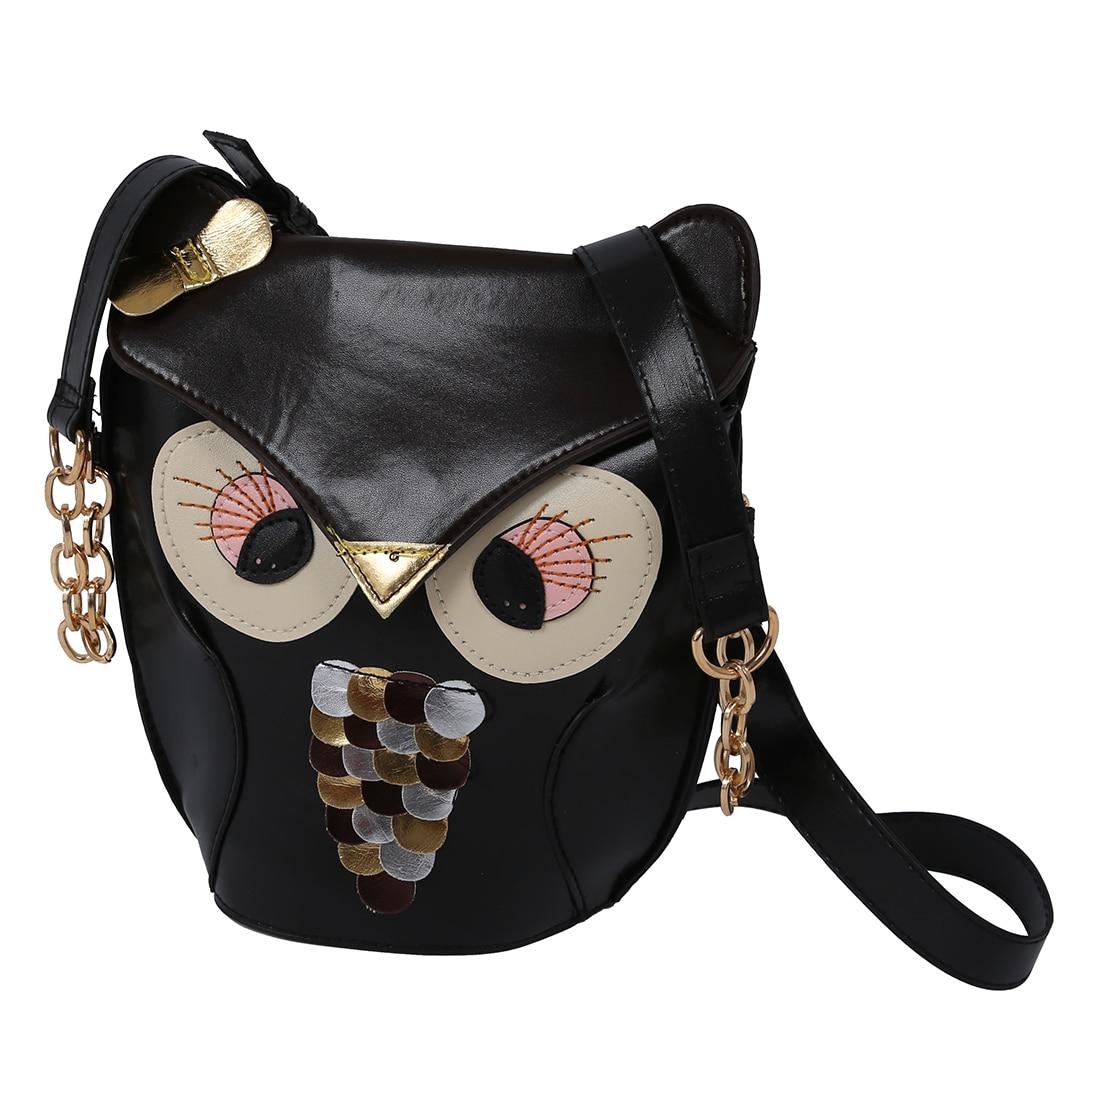 Ladies Fashion Adjustable Owl Pattern Chain Shoulder Bag